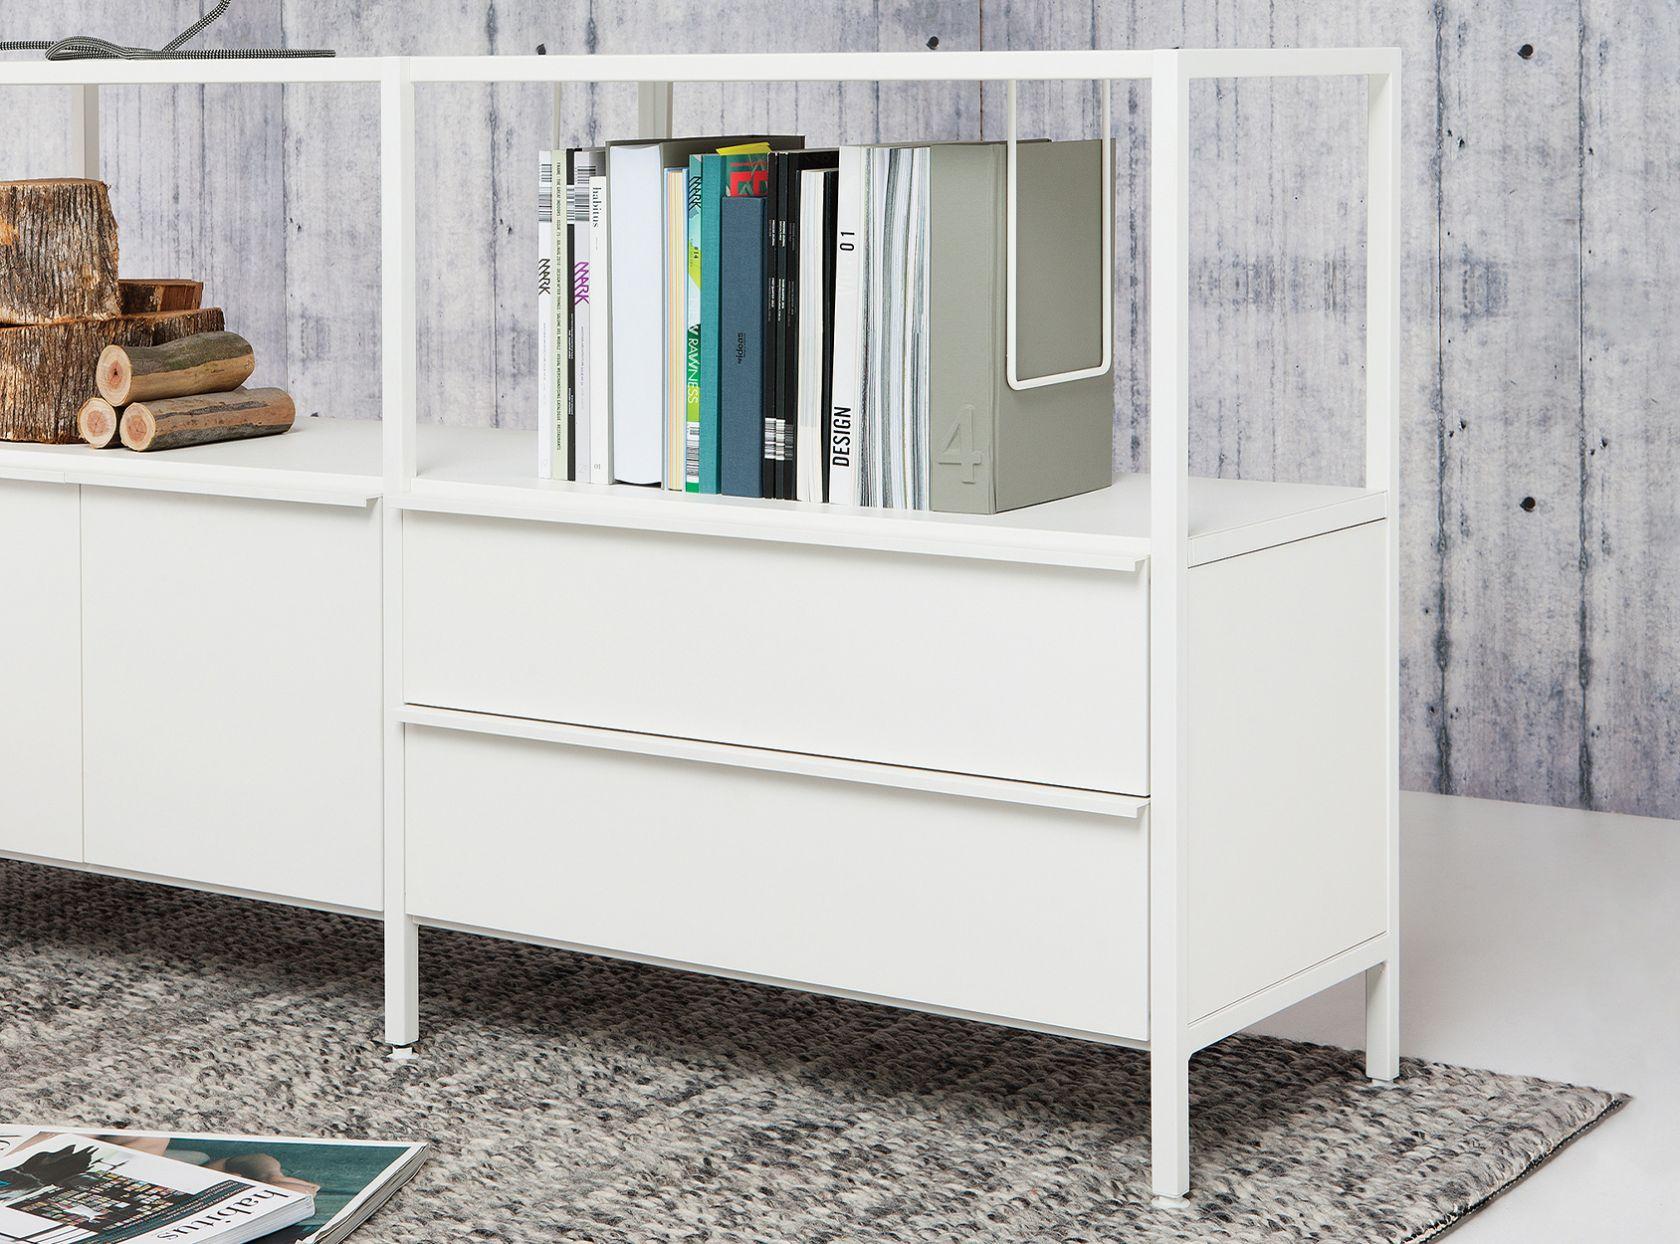 schiavello case storage in white cabinet with rug underneath